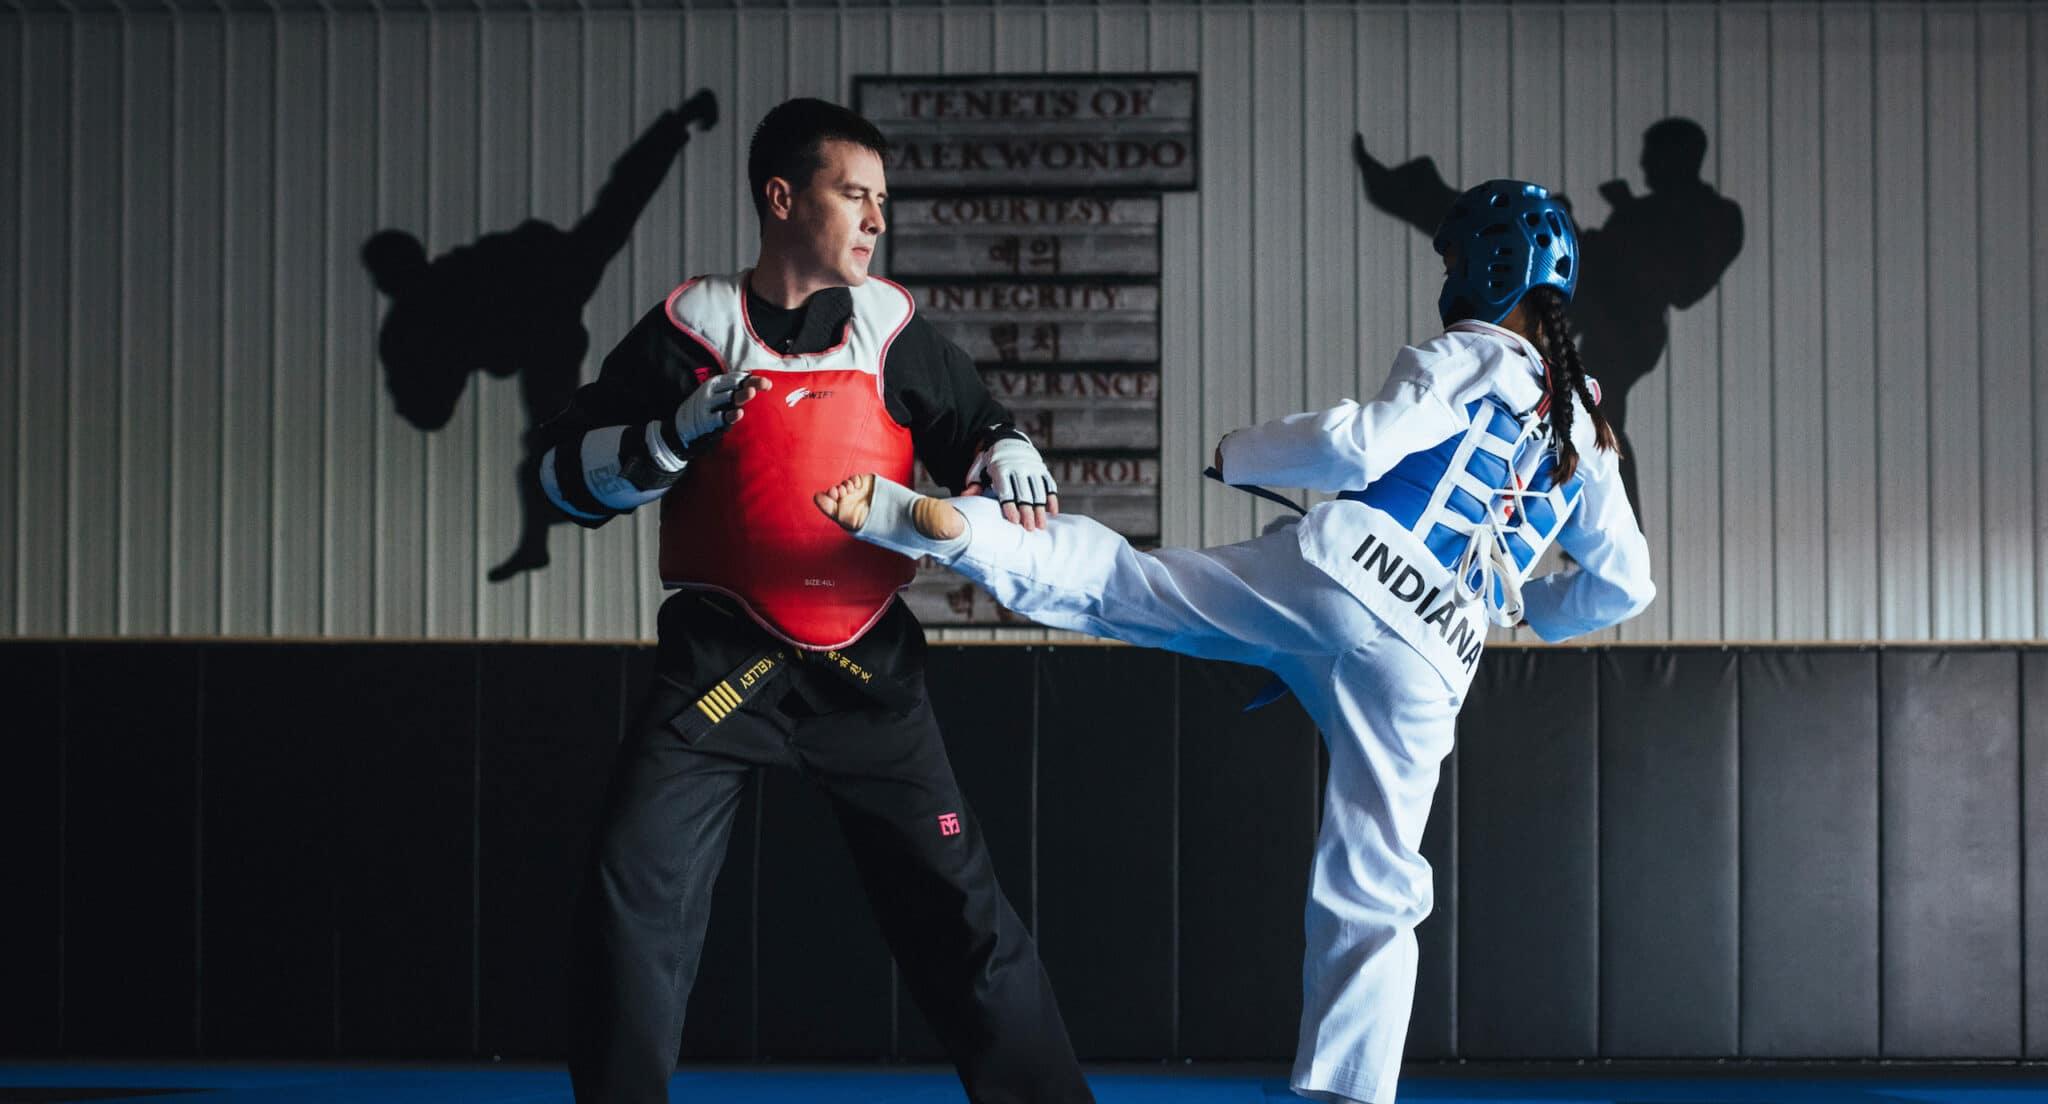 Total Taekwondo Core Sparring